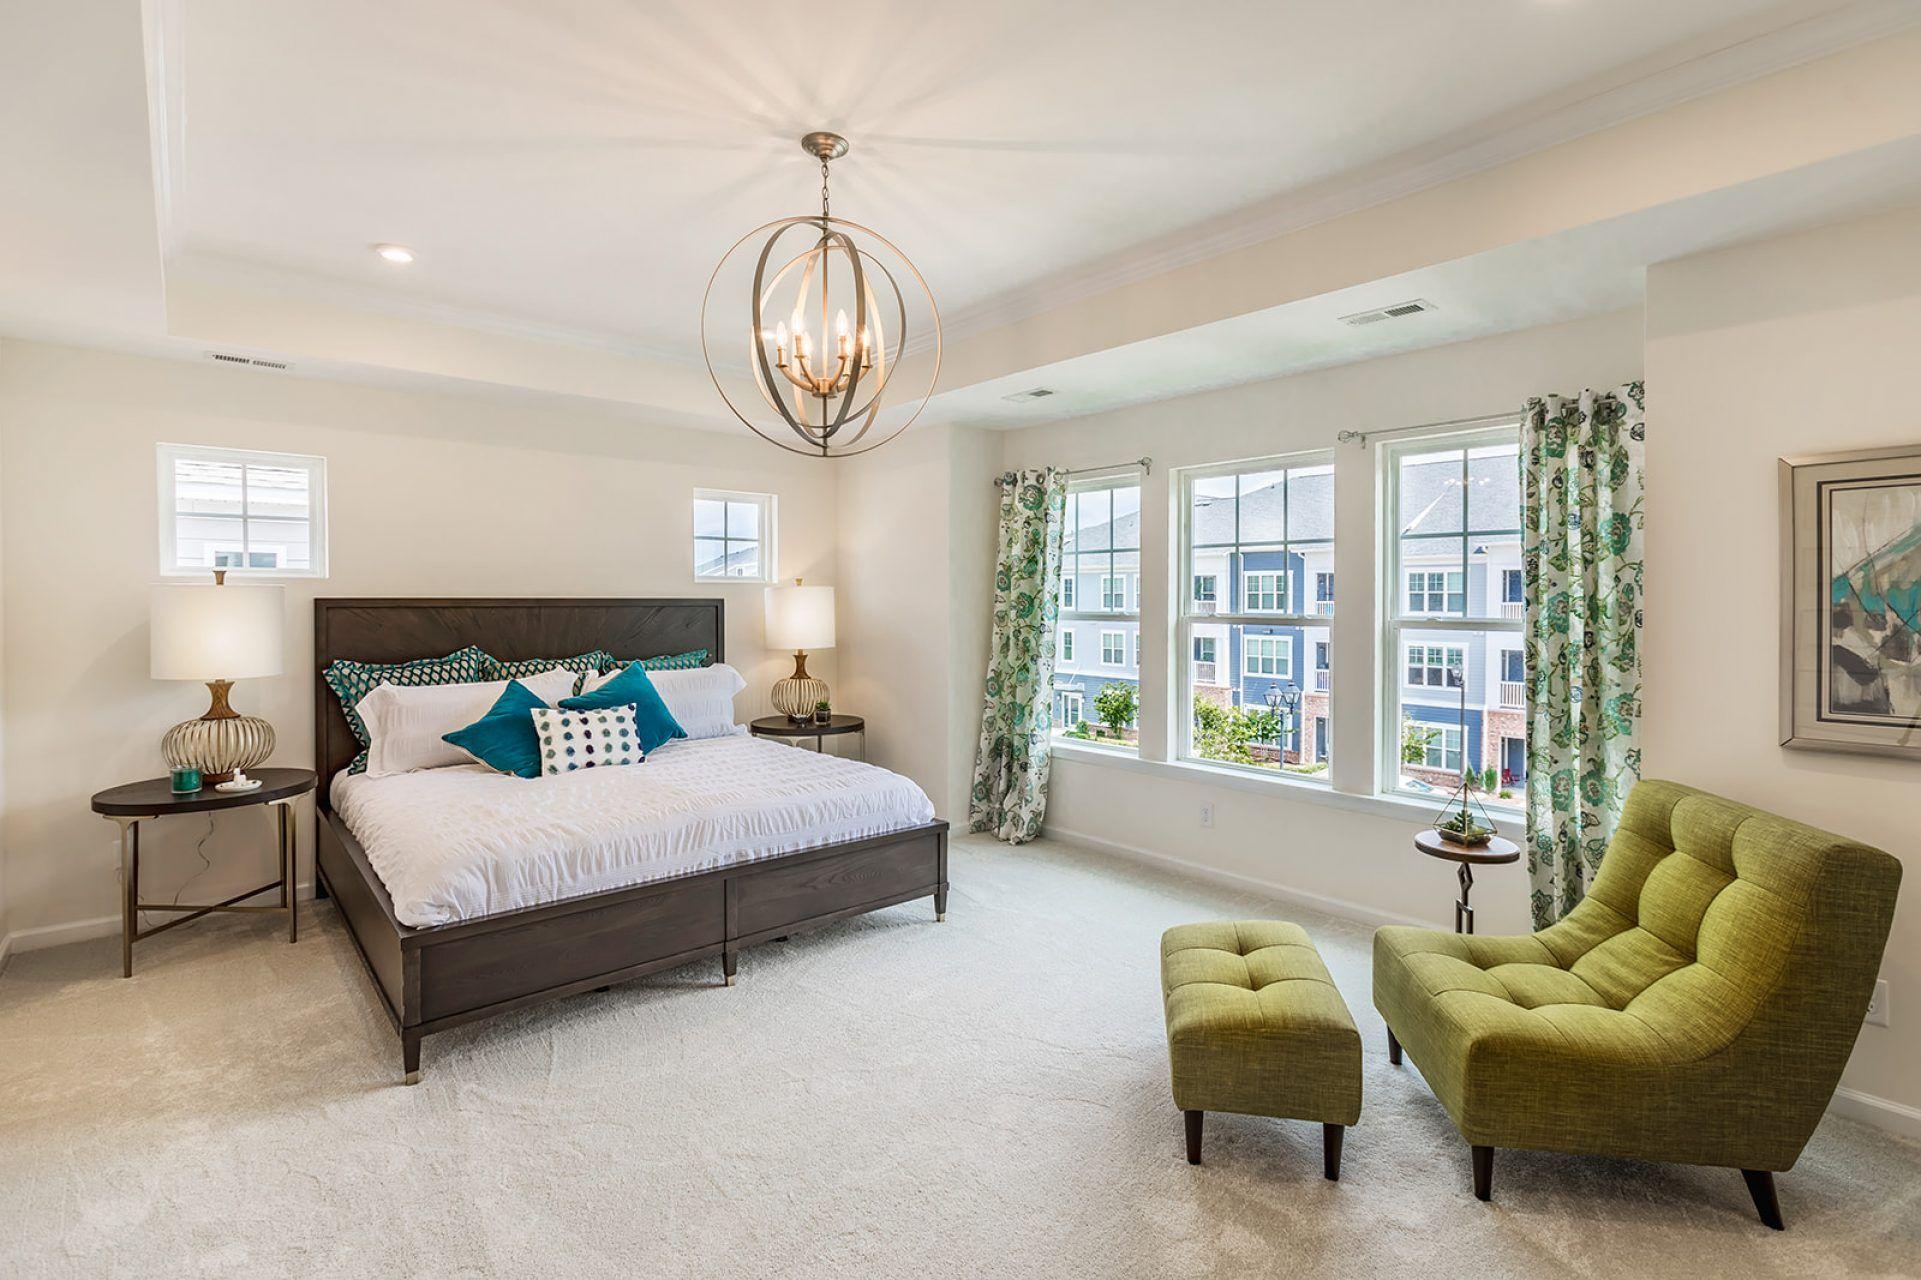 Bedroom featured in the Rockford By HHHunt Homes LLC in Norfolk-Newport News, VA